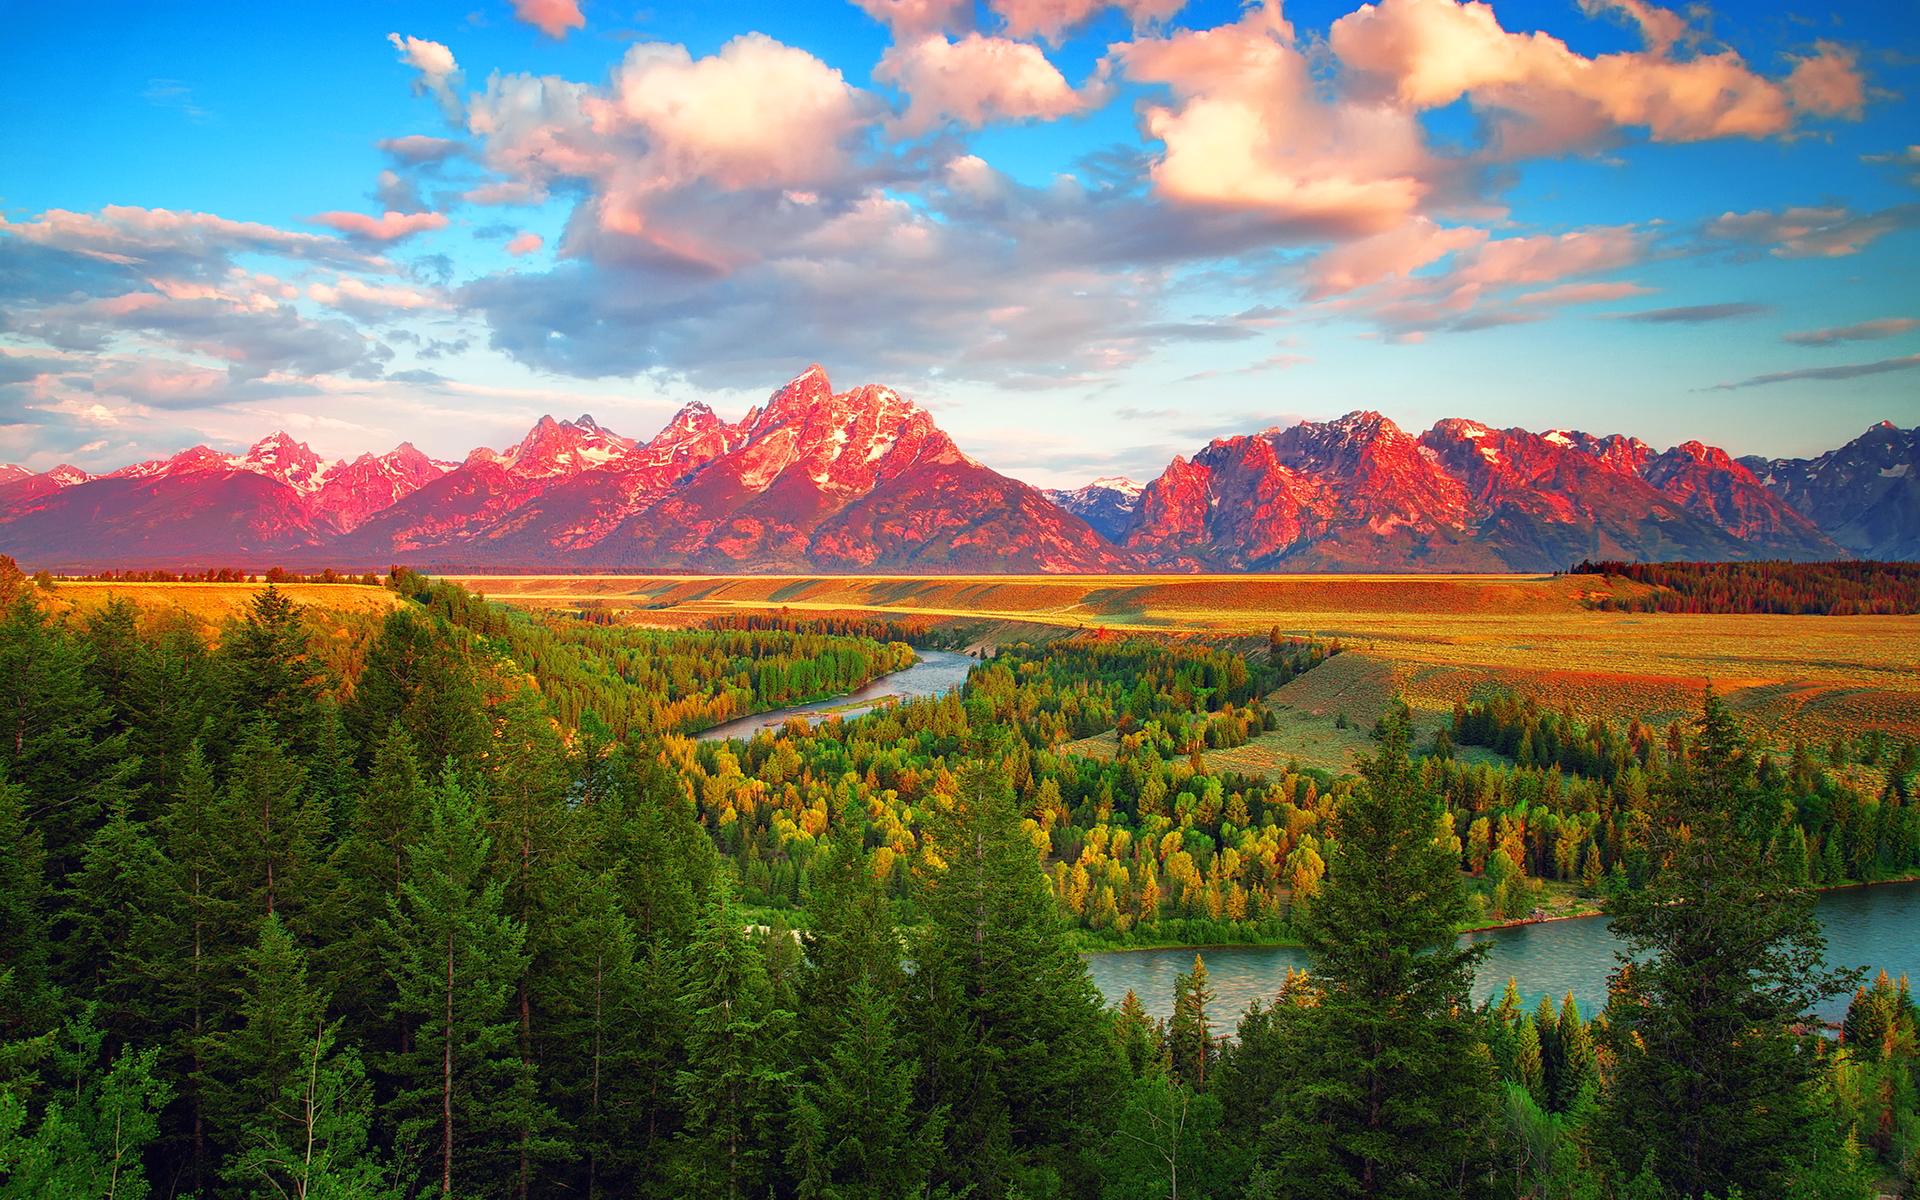 landscape photography nature hd desktop wallpapers 4k hd